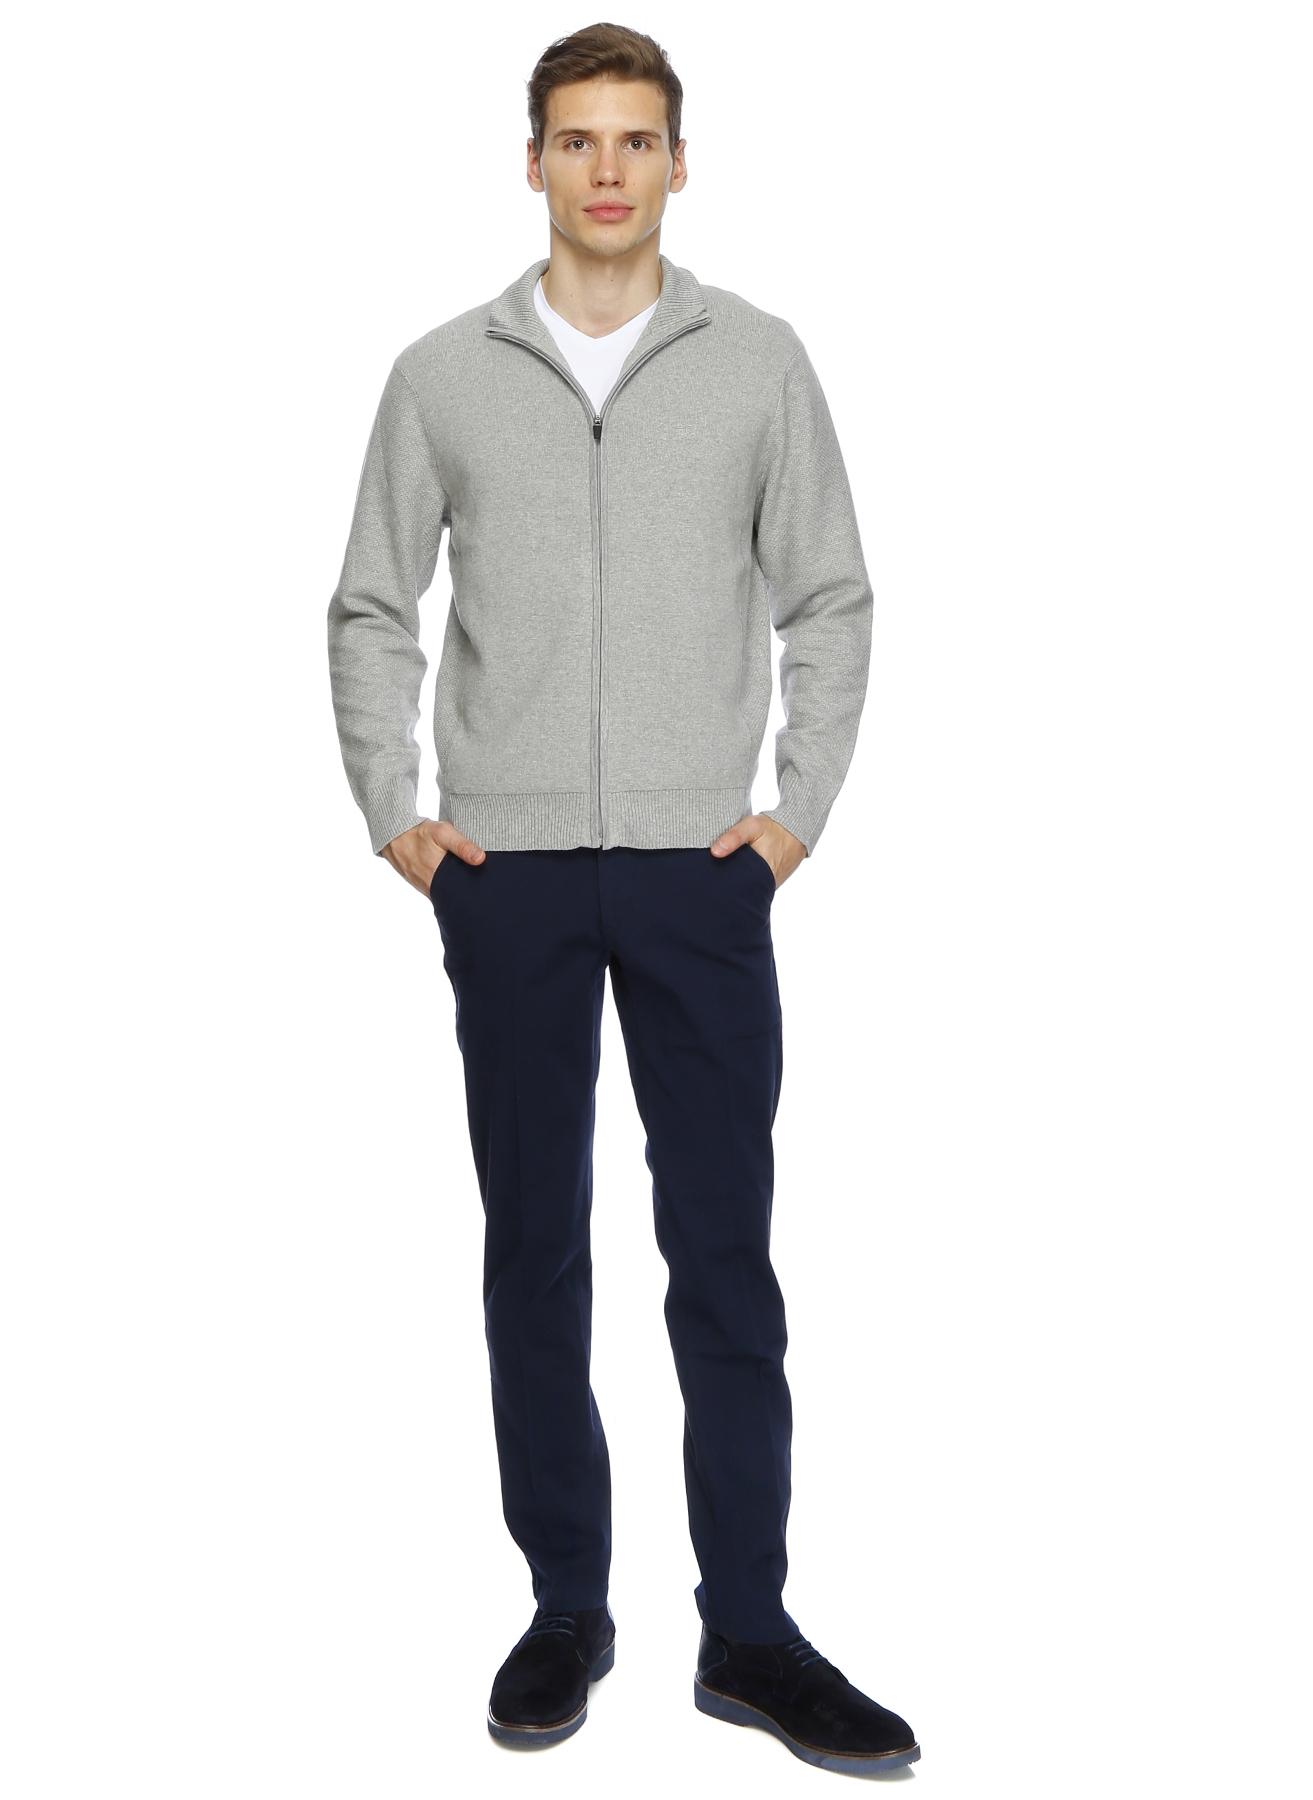 Dockers Smart 360 Flex Workday Slim Tapered Klasik Pantolon 33-32 5000166385010 Ürün Resmi